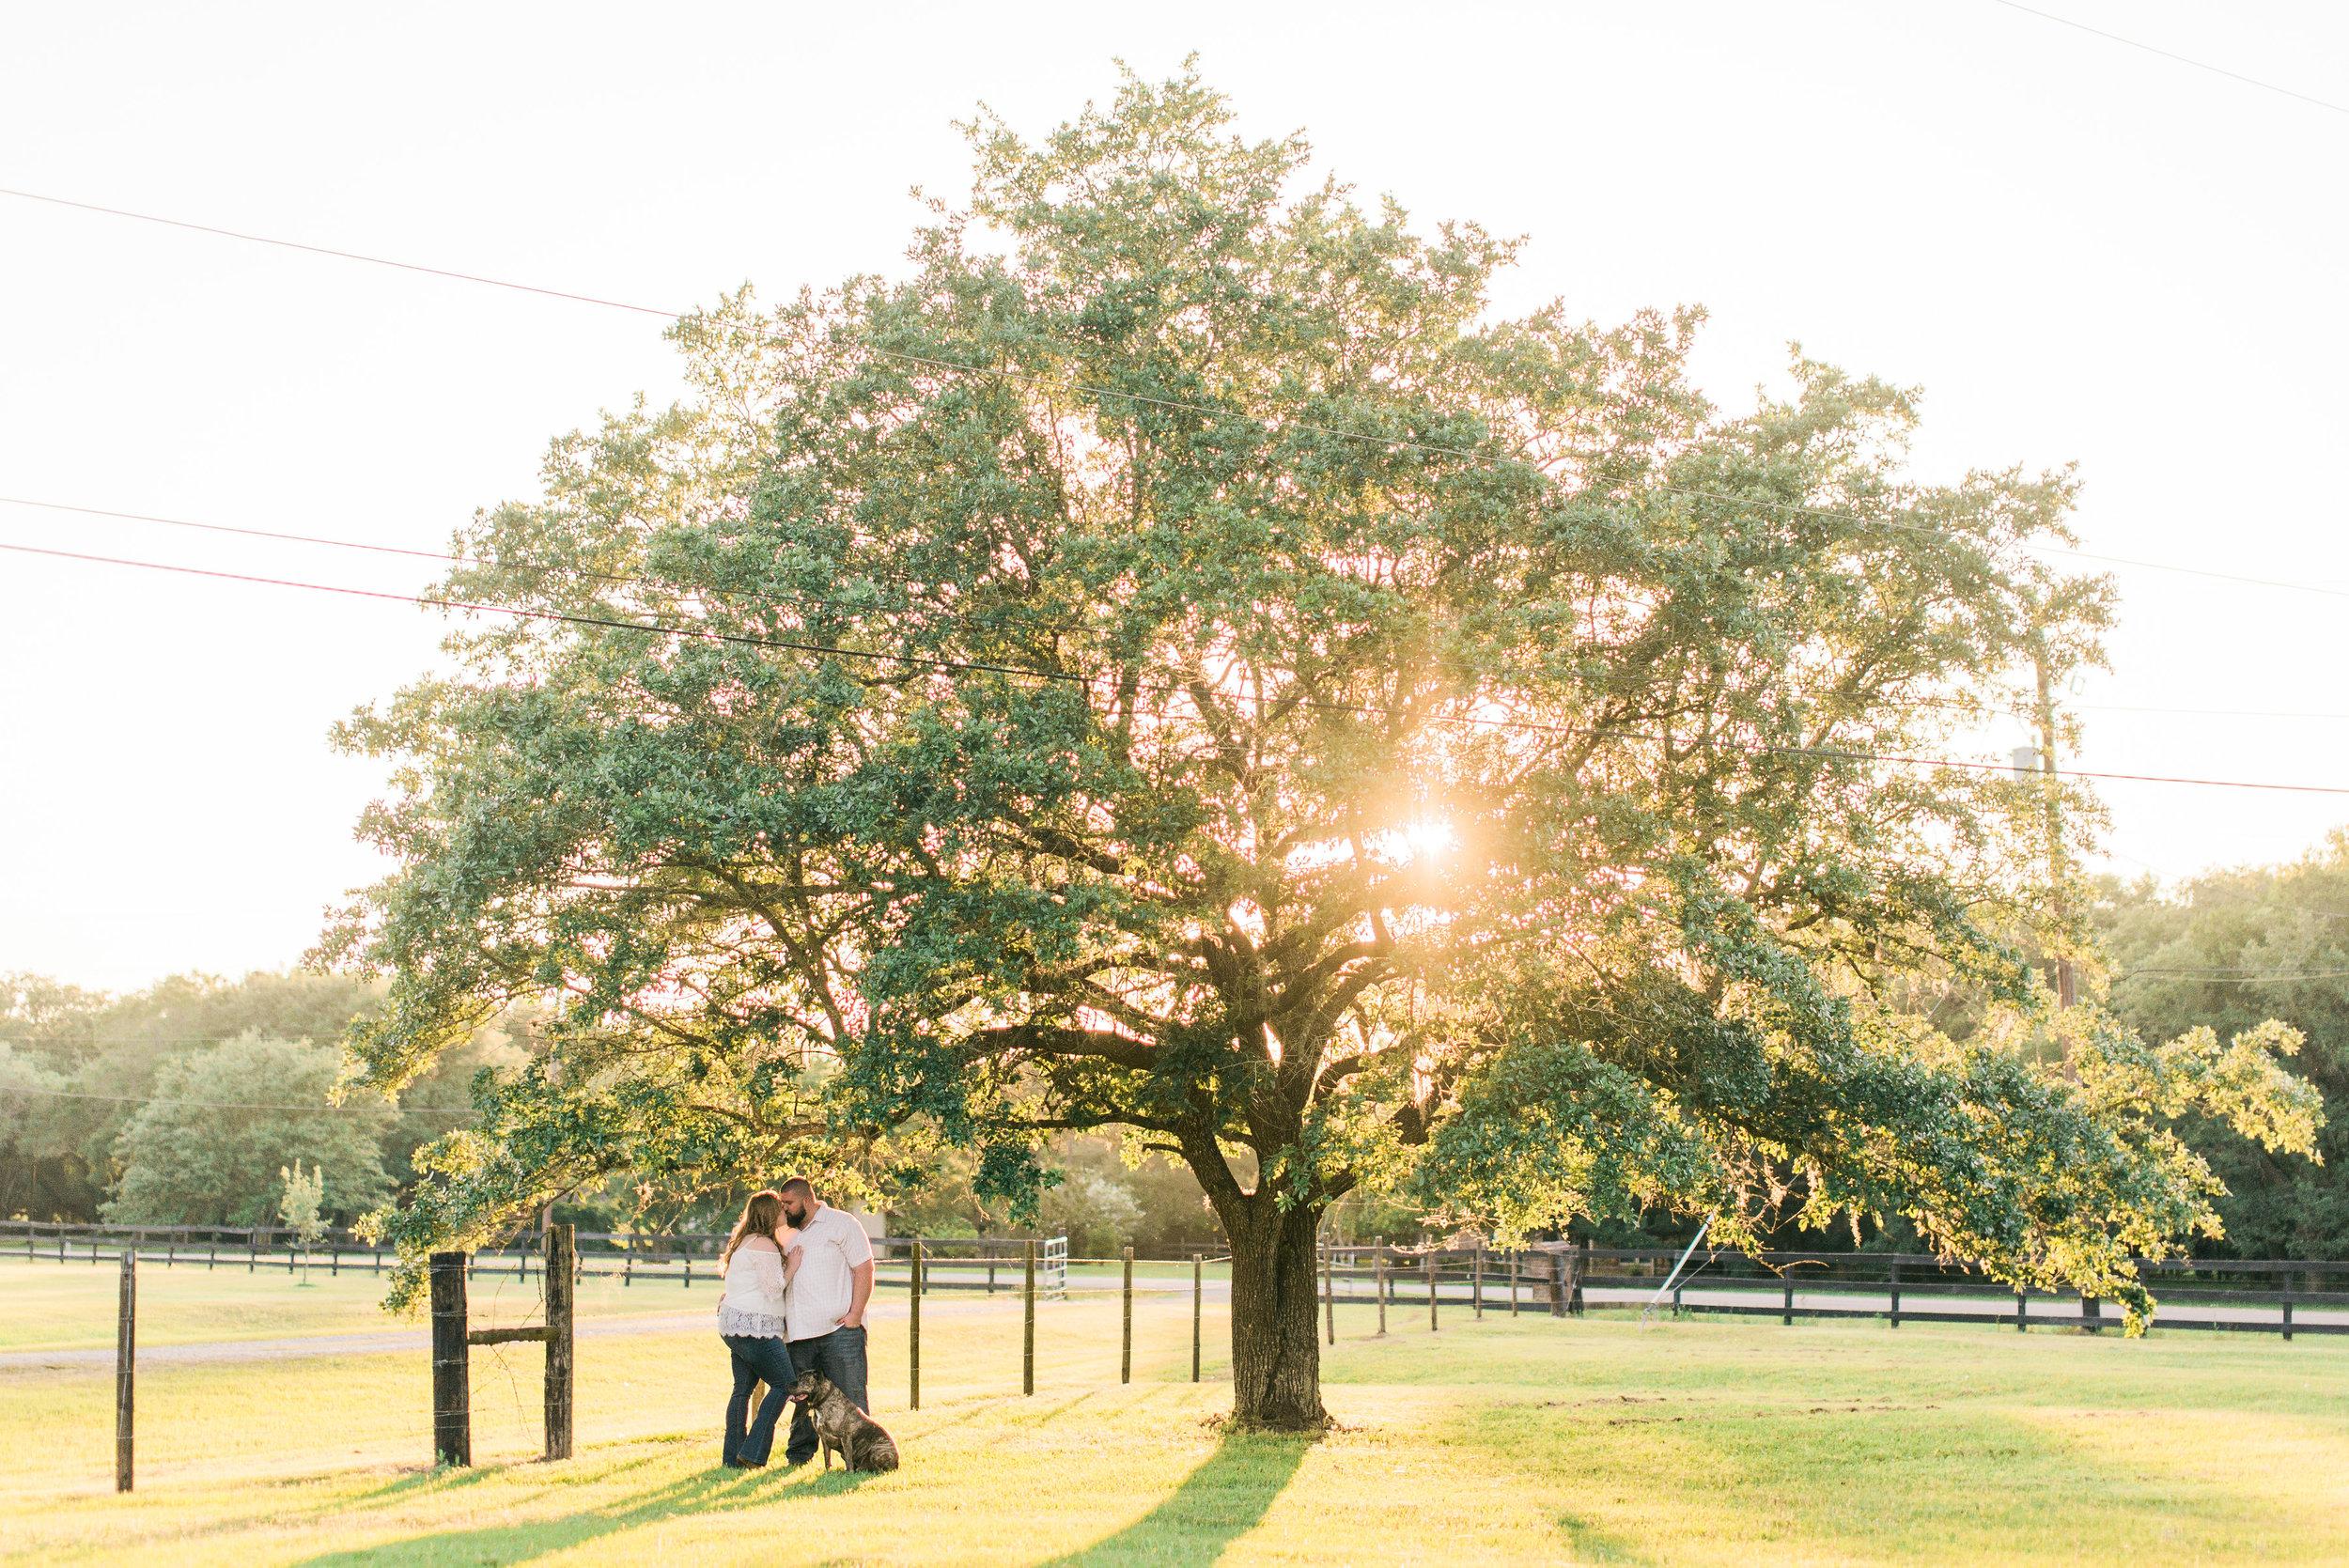 AlvinTexasPhotographer_ManvelTexasEngagementSession_HoustonWeddingPhotographer_EngagementPhotographerHouston (16).jpg